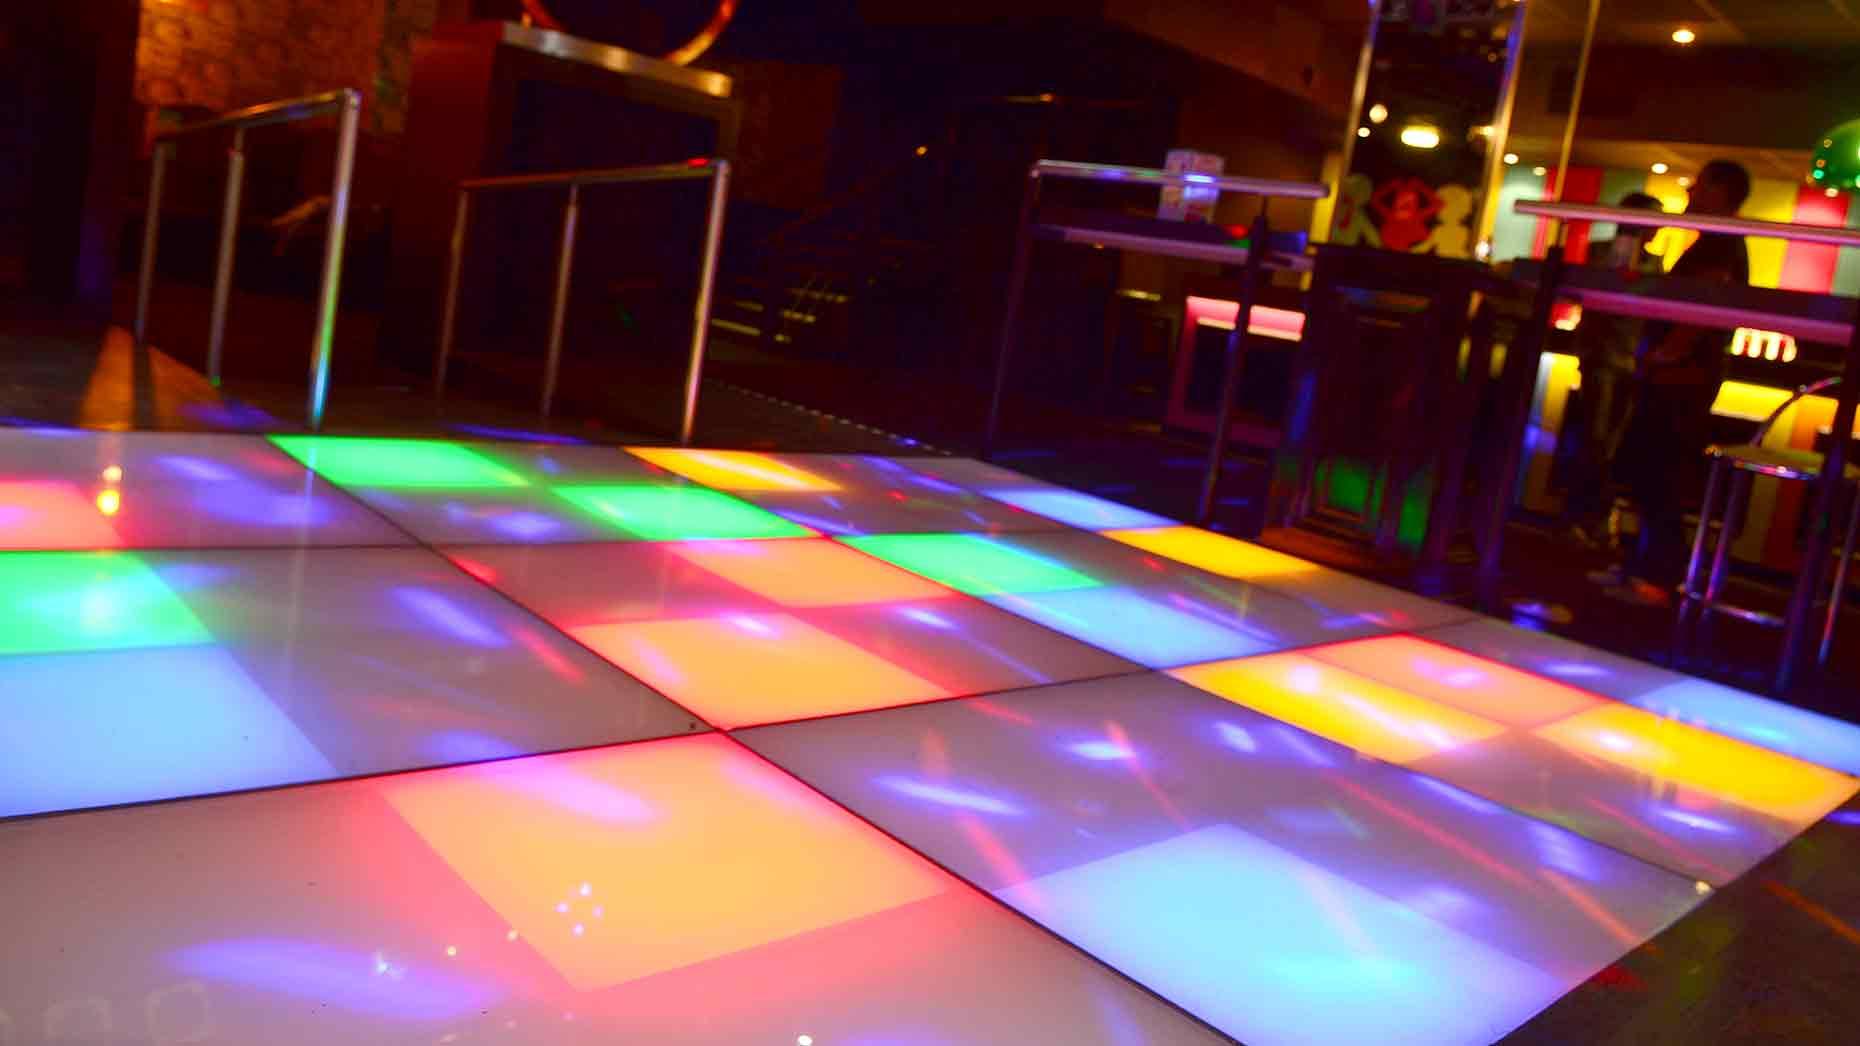 The Shack dance floor. Photo: Steve Smailes for The Lincolnite